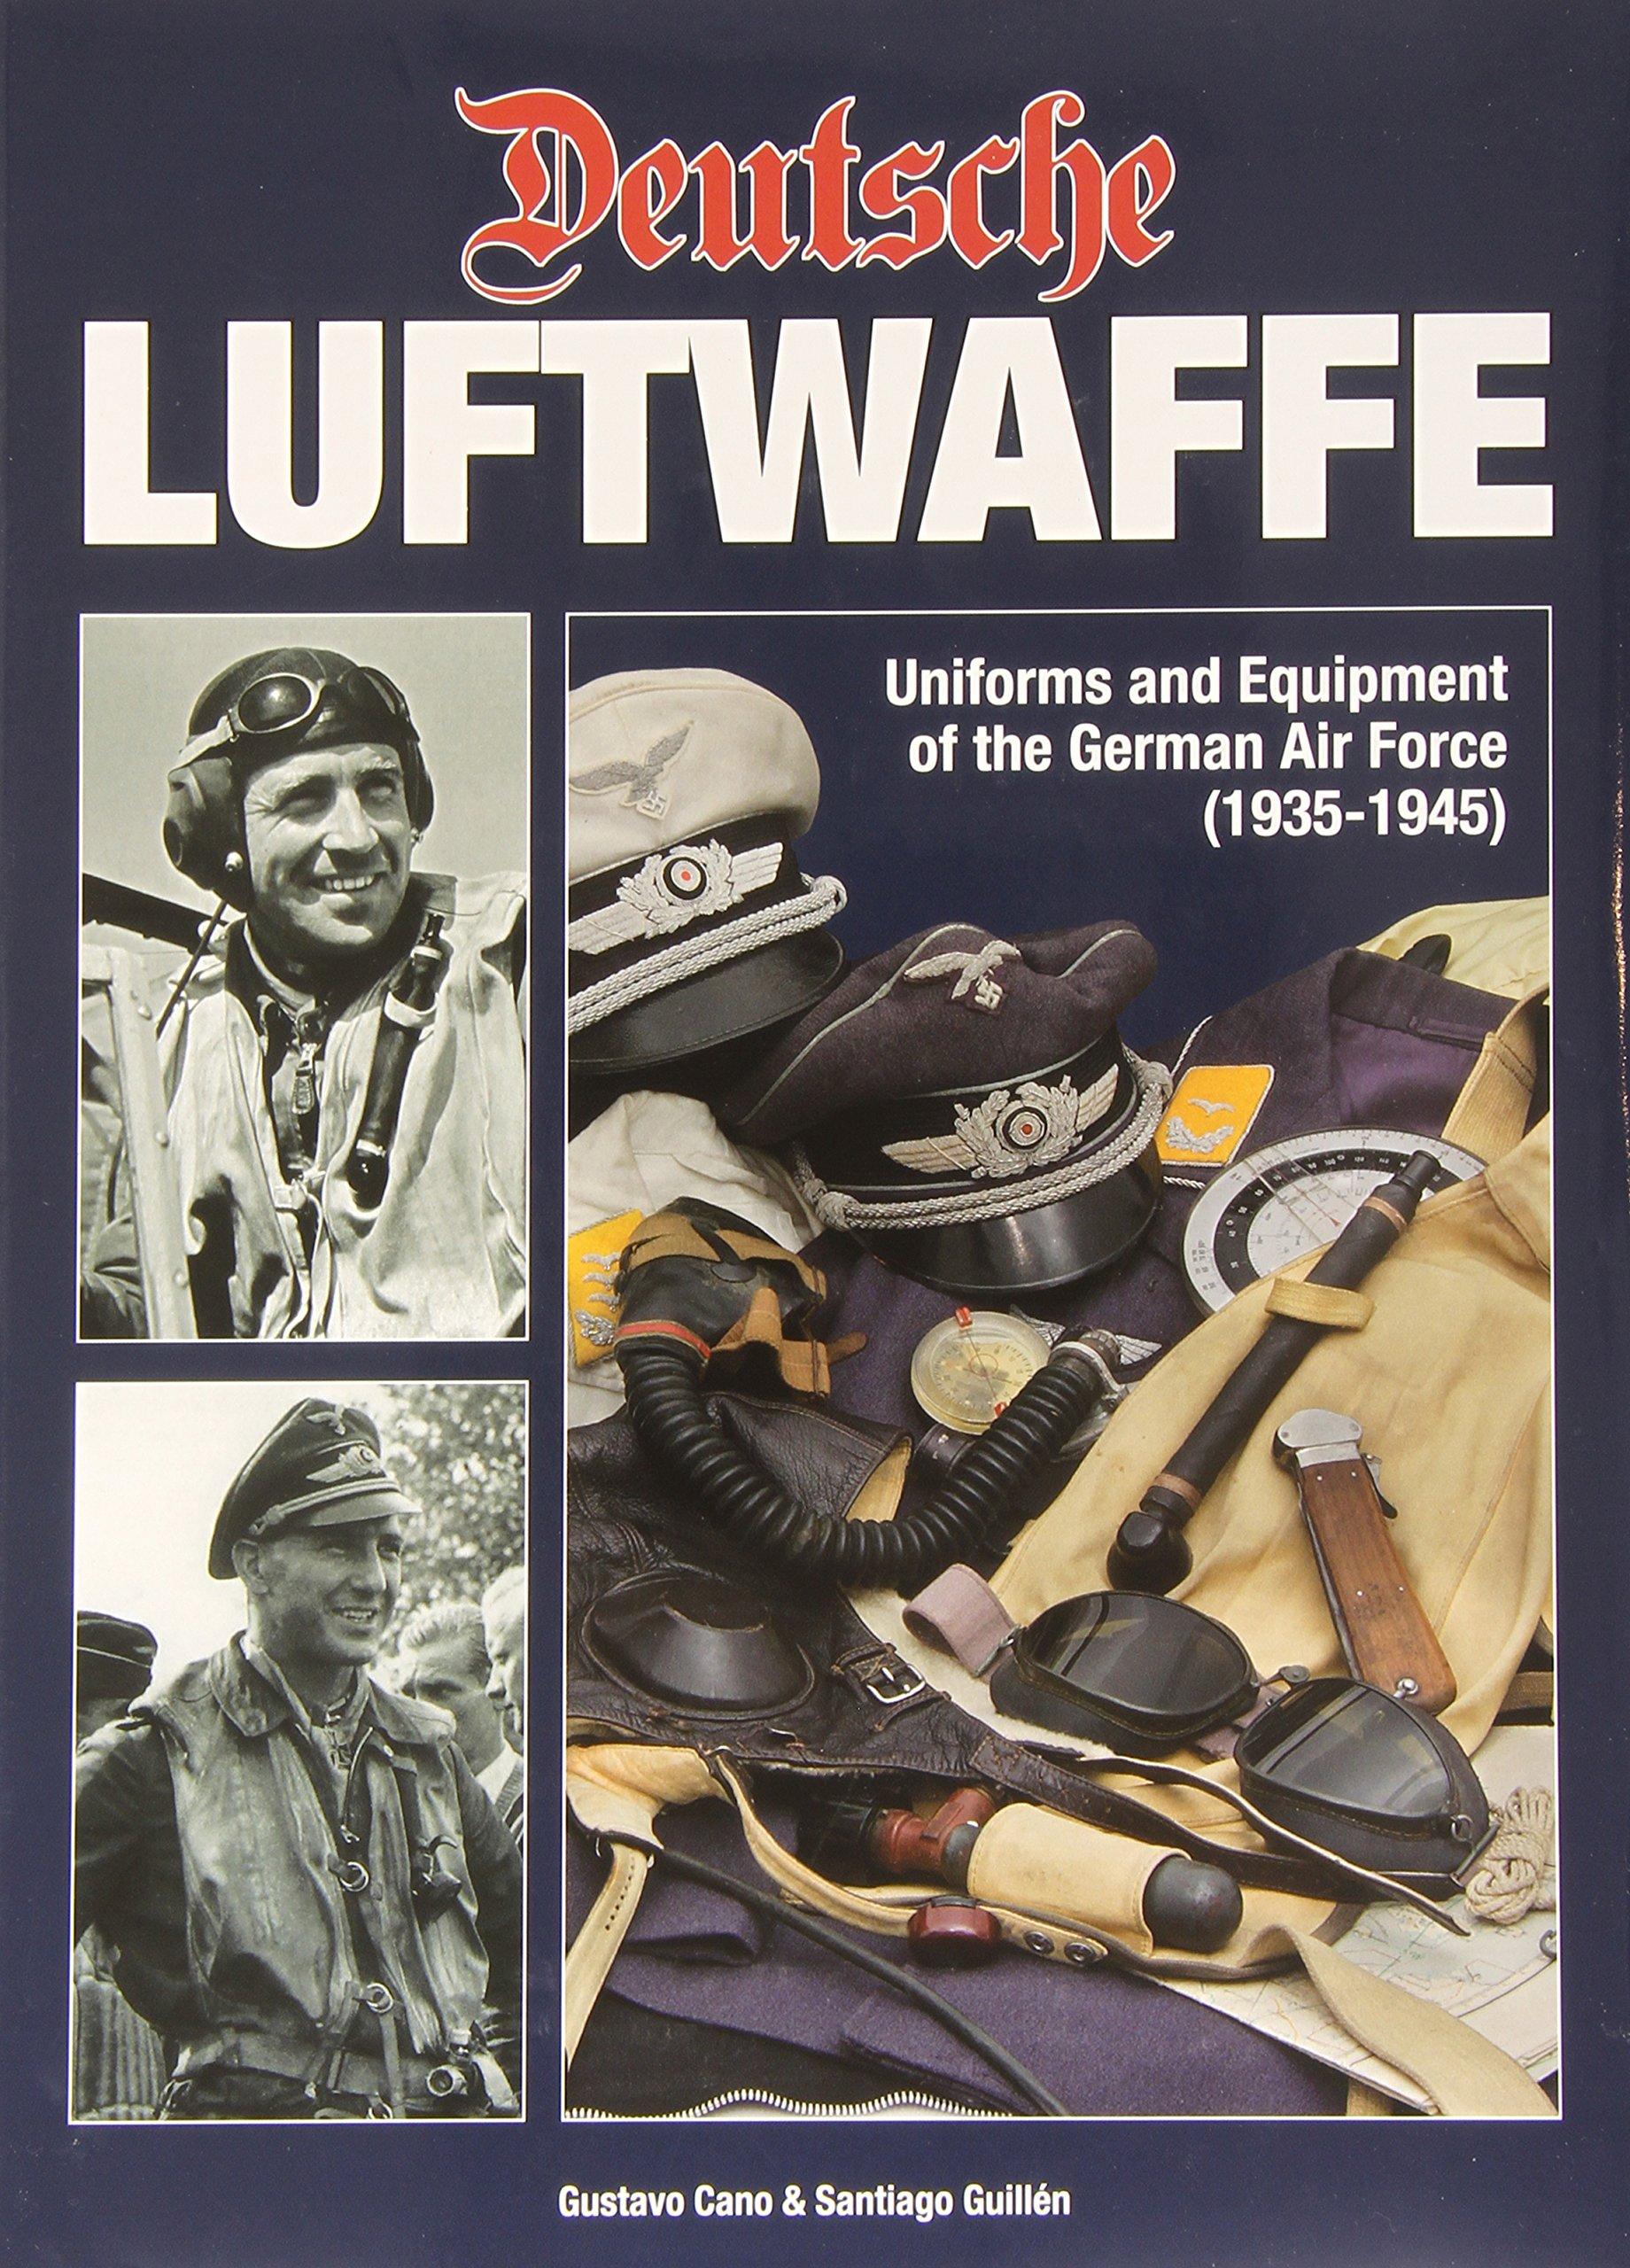 Deutsche Luftwaffe: Uniforms and Equipment of the German Pilot